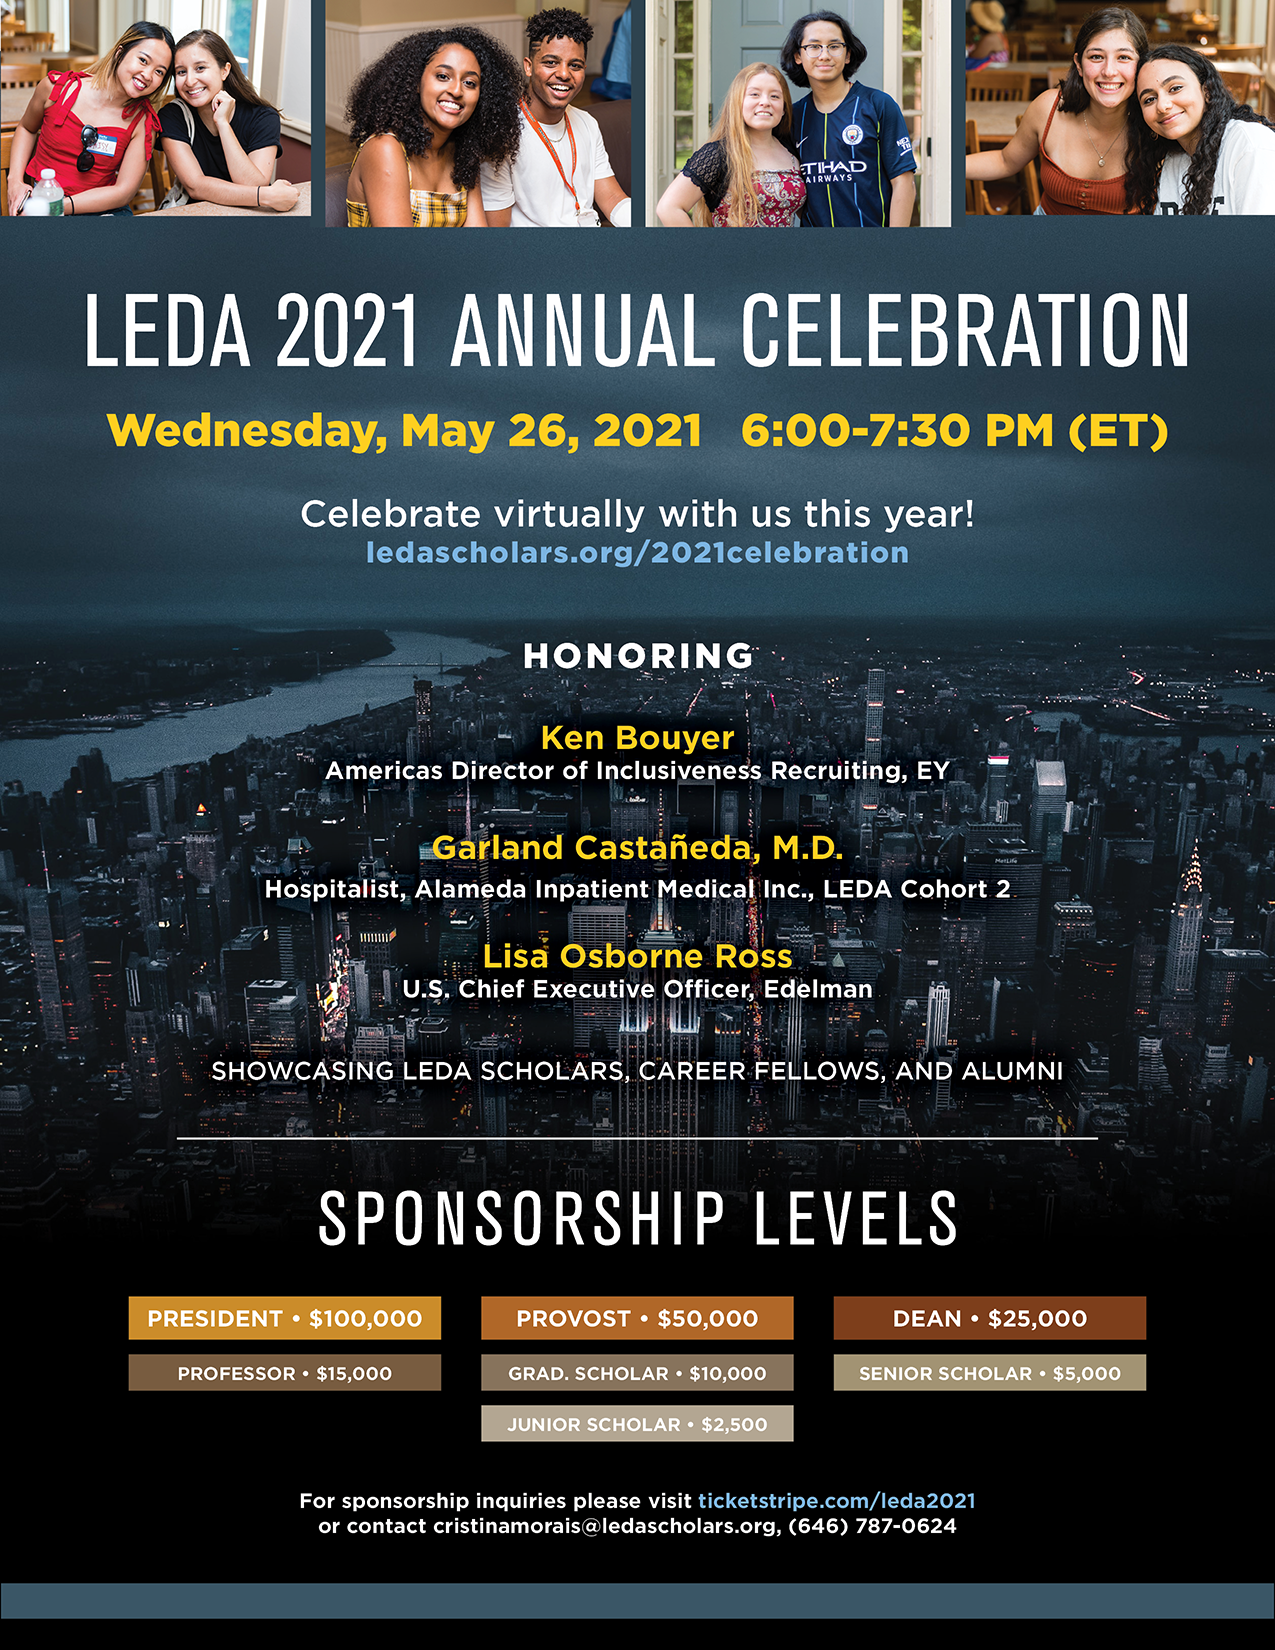 2021 LEDA Annual Celebration Invitation